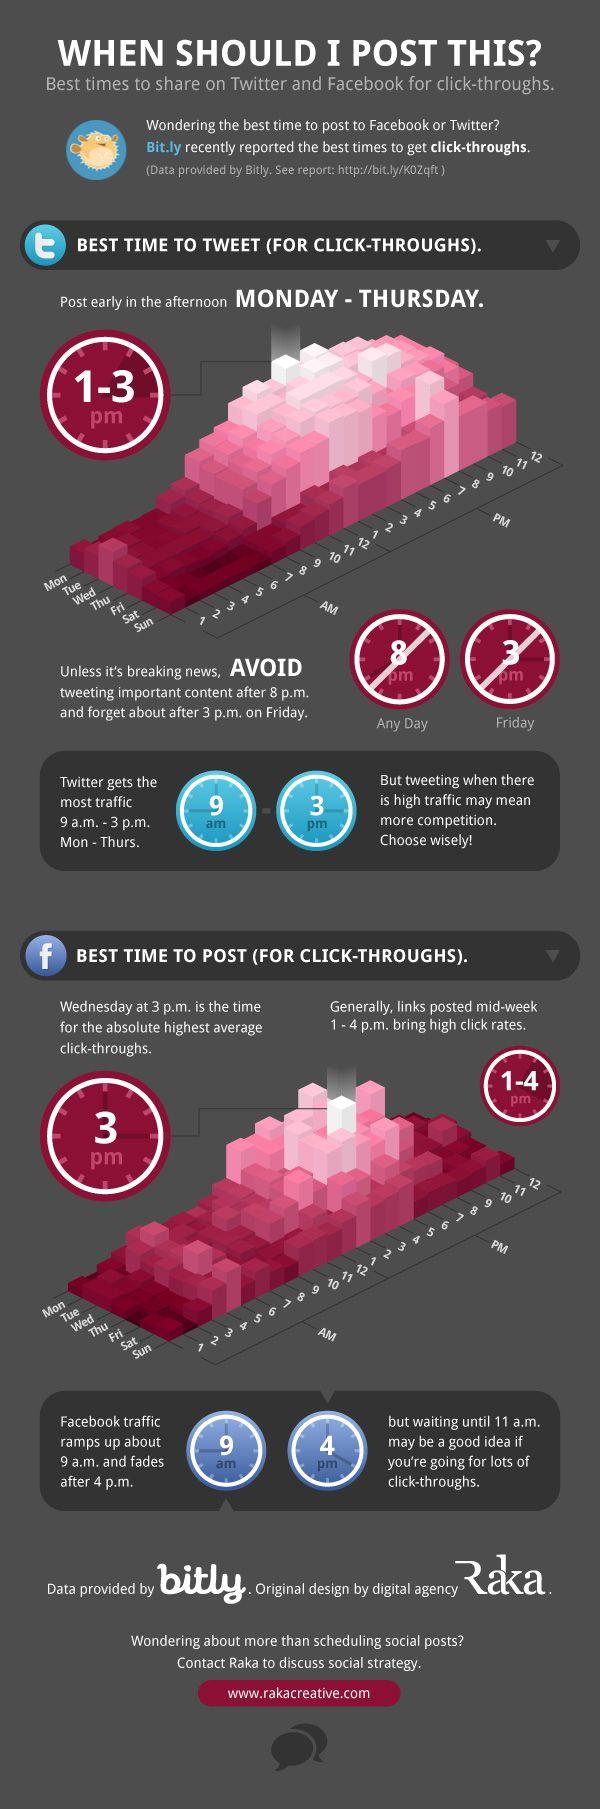 Las mejores horas de FaceBook y Twitter: Social Network, Twitter, Data Visual, Social Media, Facebook, Posts, Media Infographic, Blog, Socialmedia